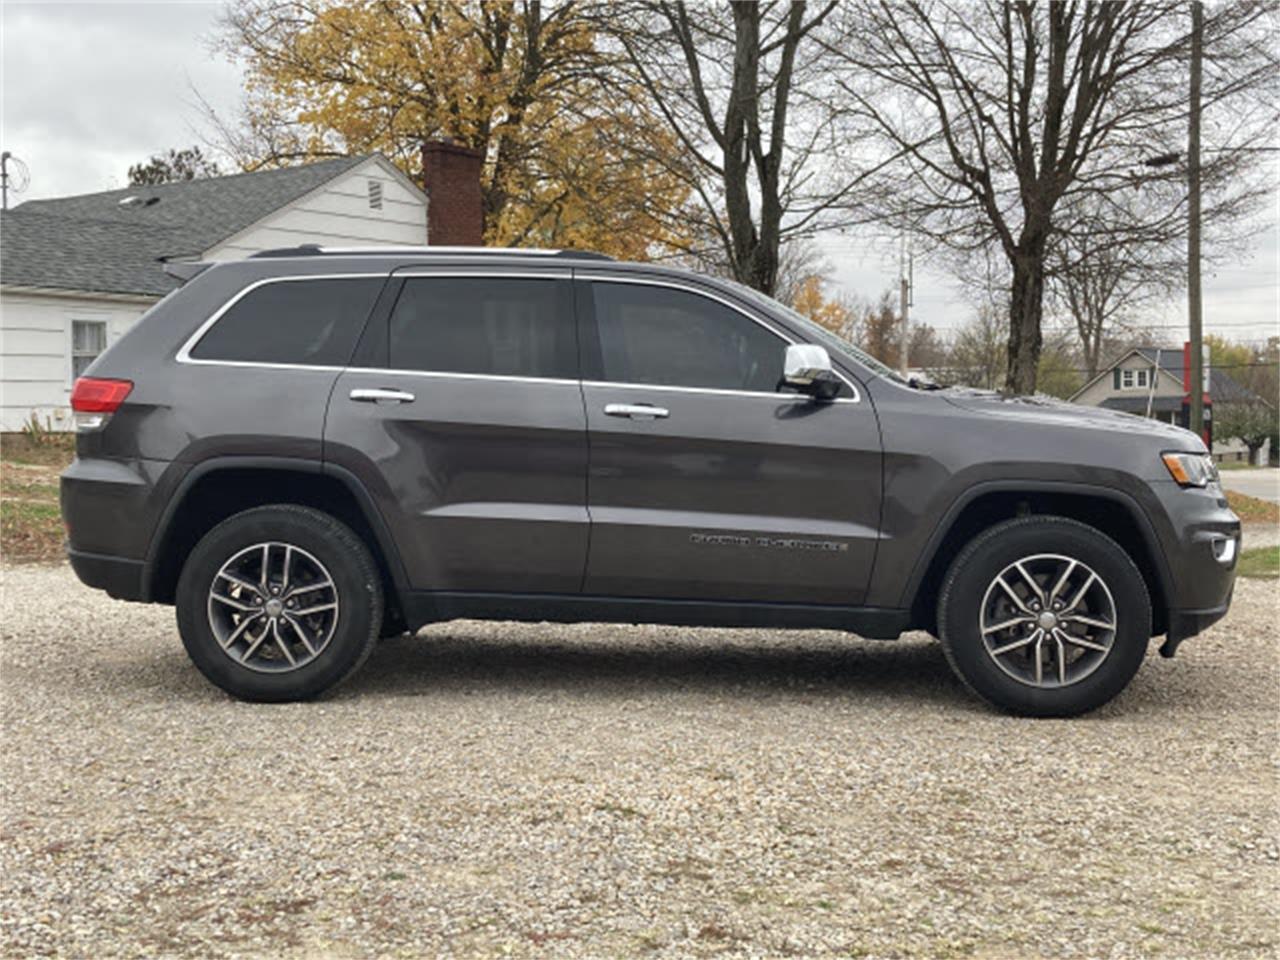 2017 Jeep Grand Cherokee (CC-1417617) for sale in Marysville, Ohio